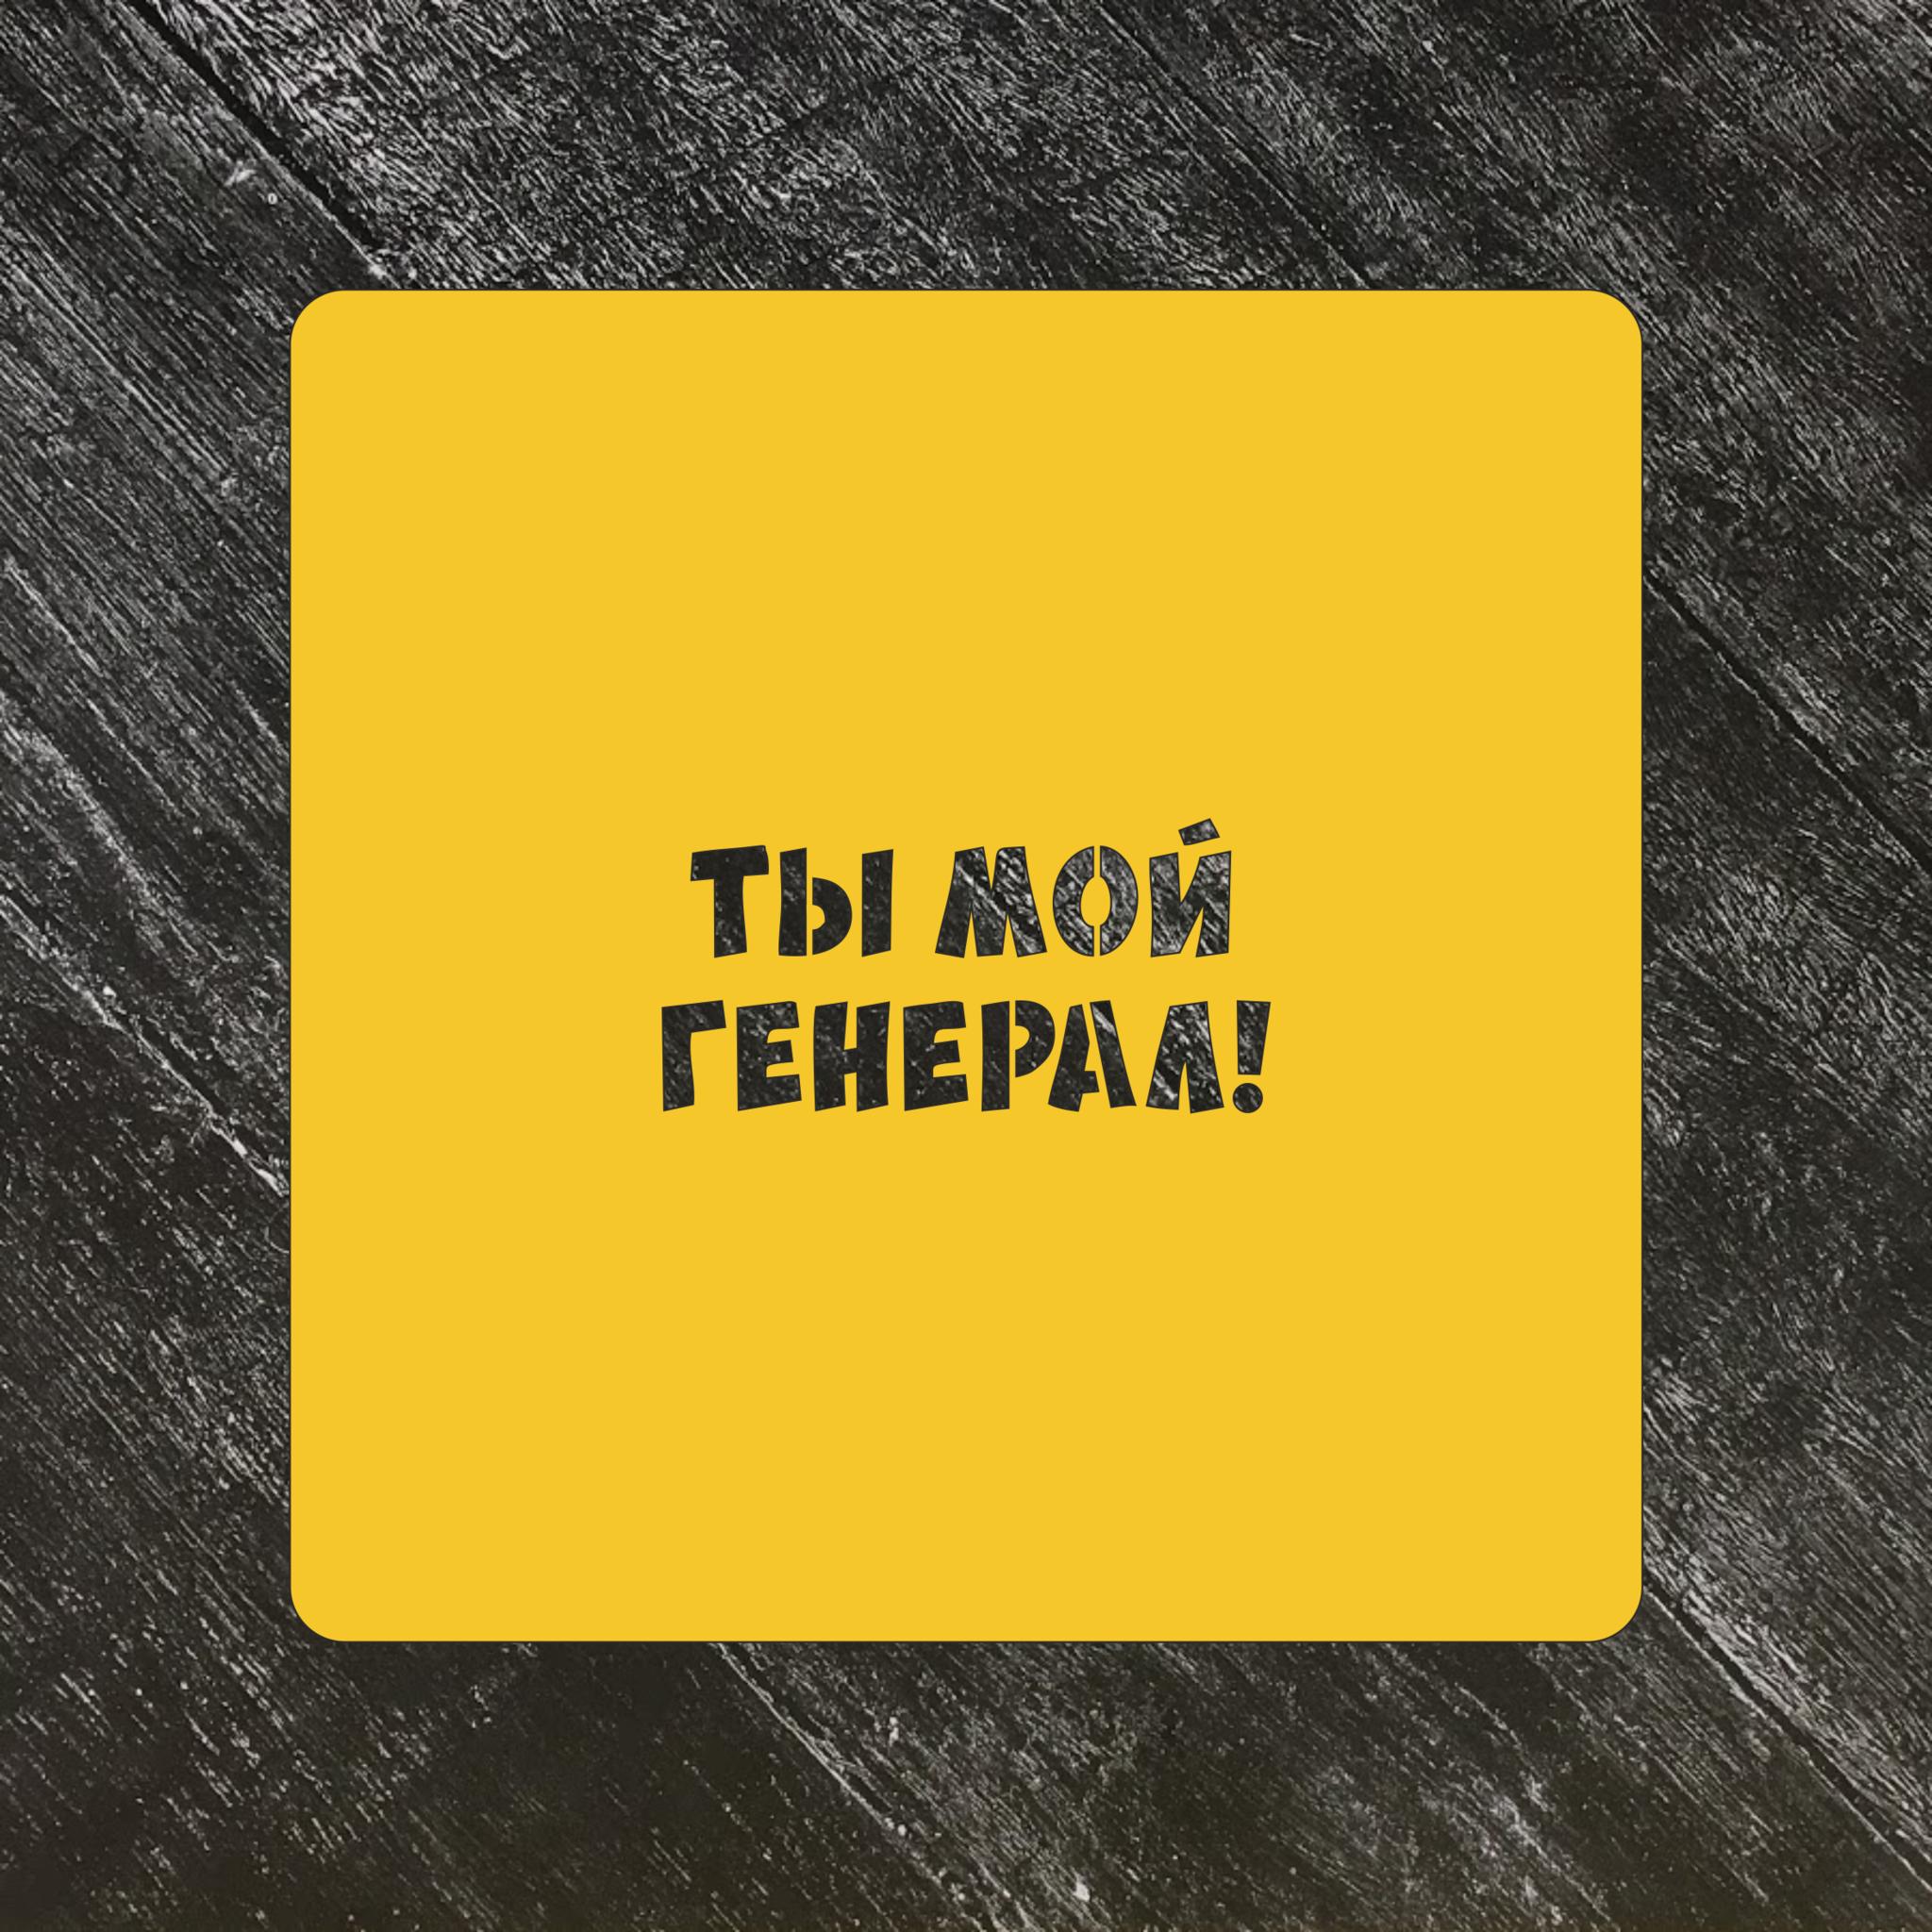 Трафарет 23 февраля №13 Ты мой генерал